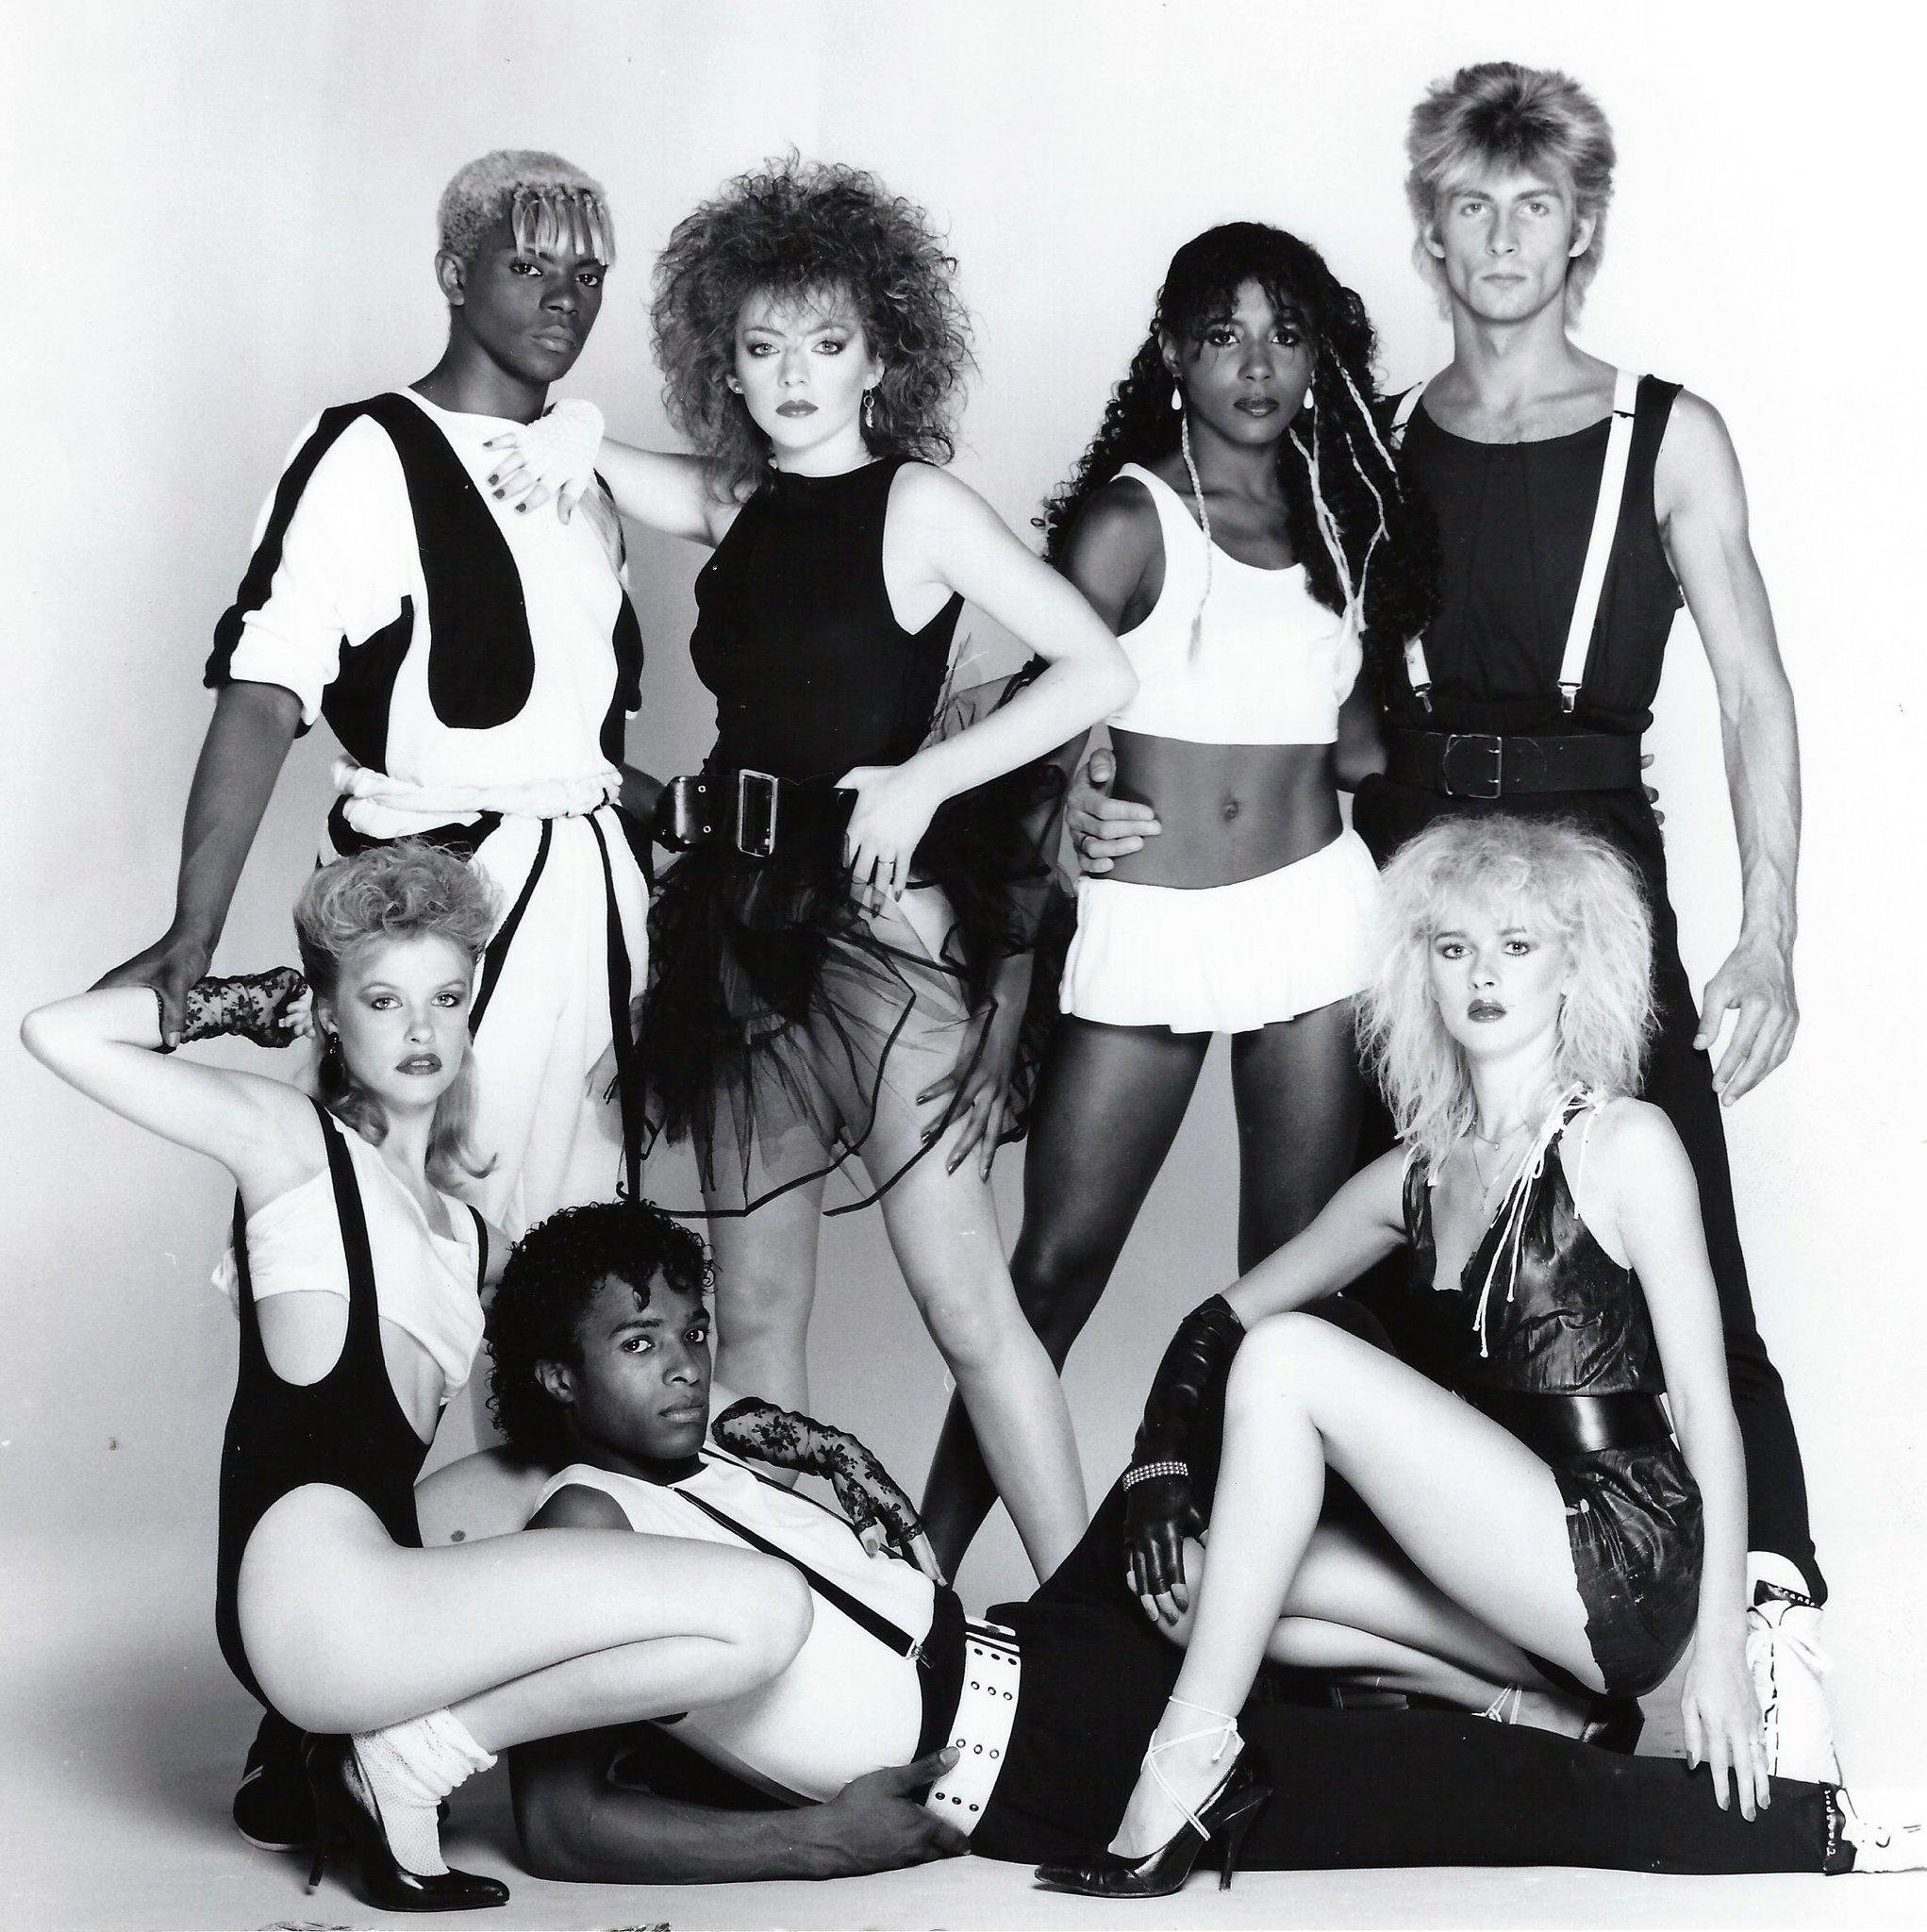 One of my Hot Gossip gangs featuring @sinittaofficial ✨#fridaynightfabulous #fashionflashbackfriday https://t.co/TQE4RRFF5N